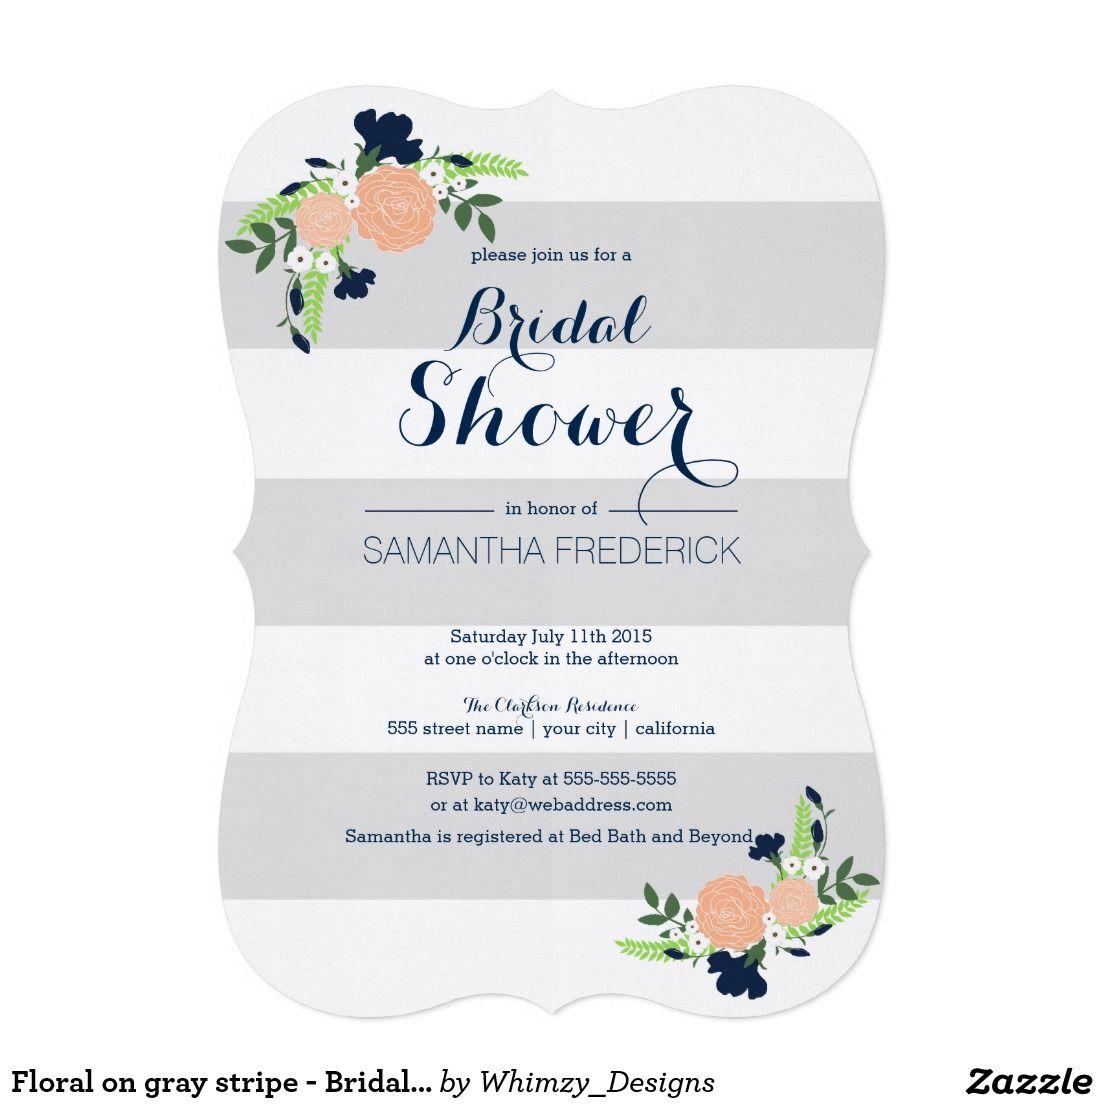 Floral on gray stripe - Bridal Shower Invitation | Grey stripes ...